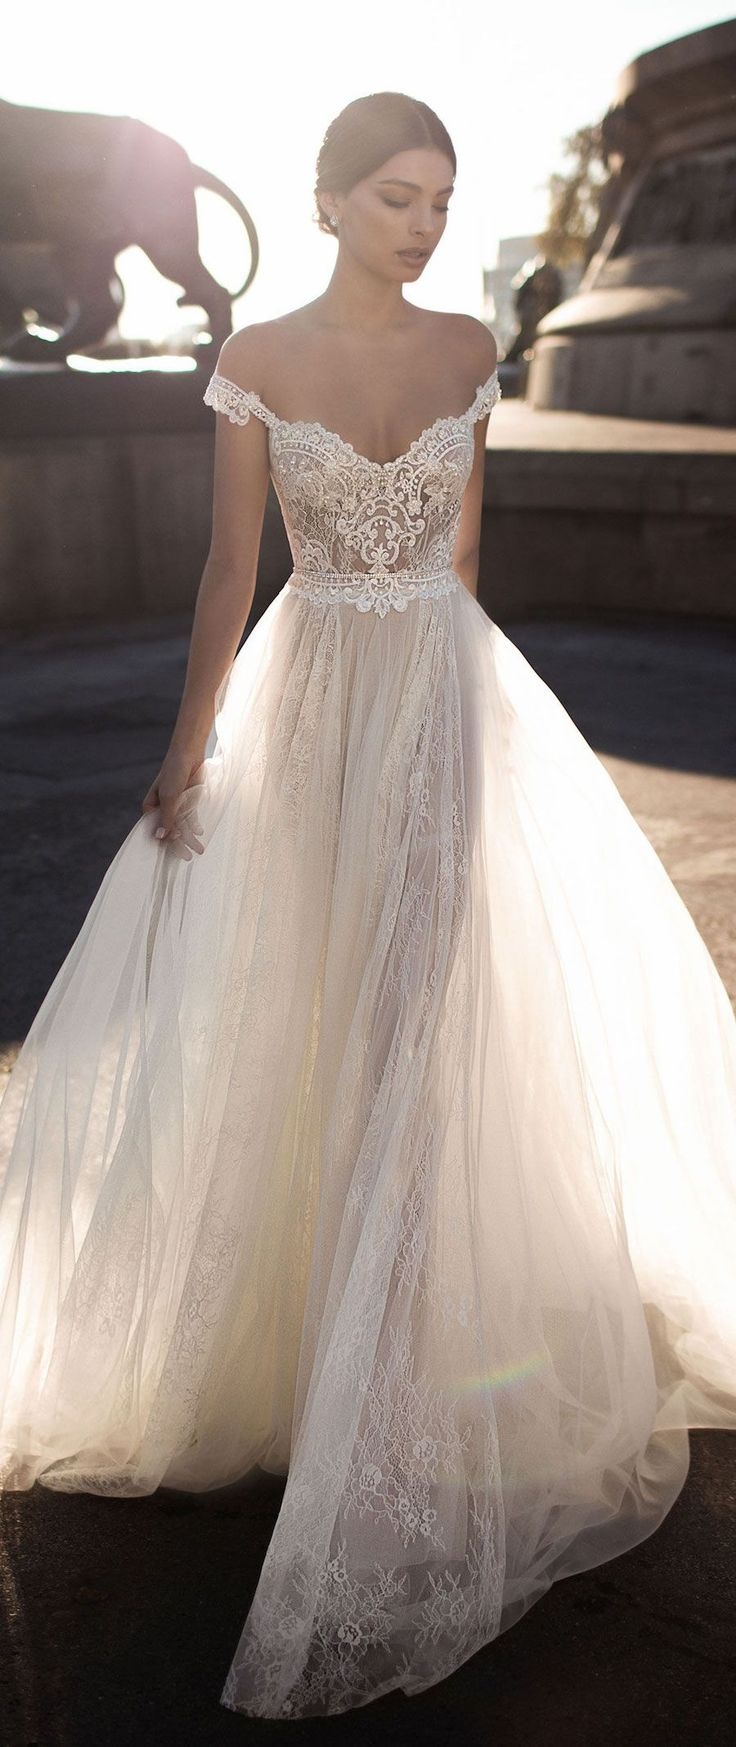 Gali Karten Bridal 2017 Wedding Dress